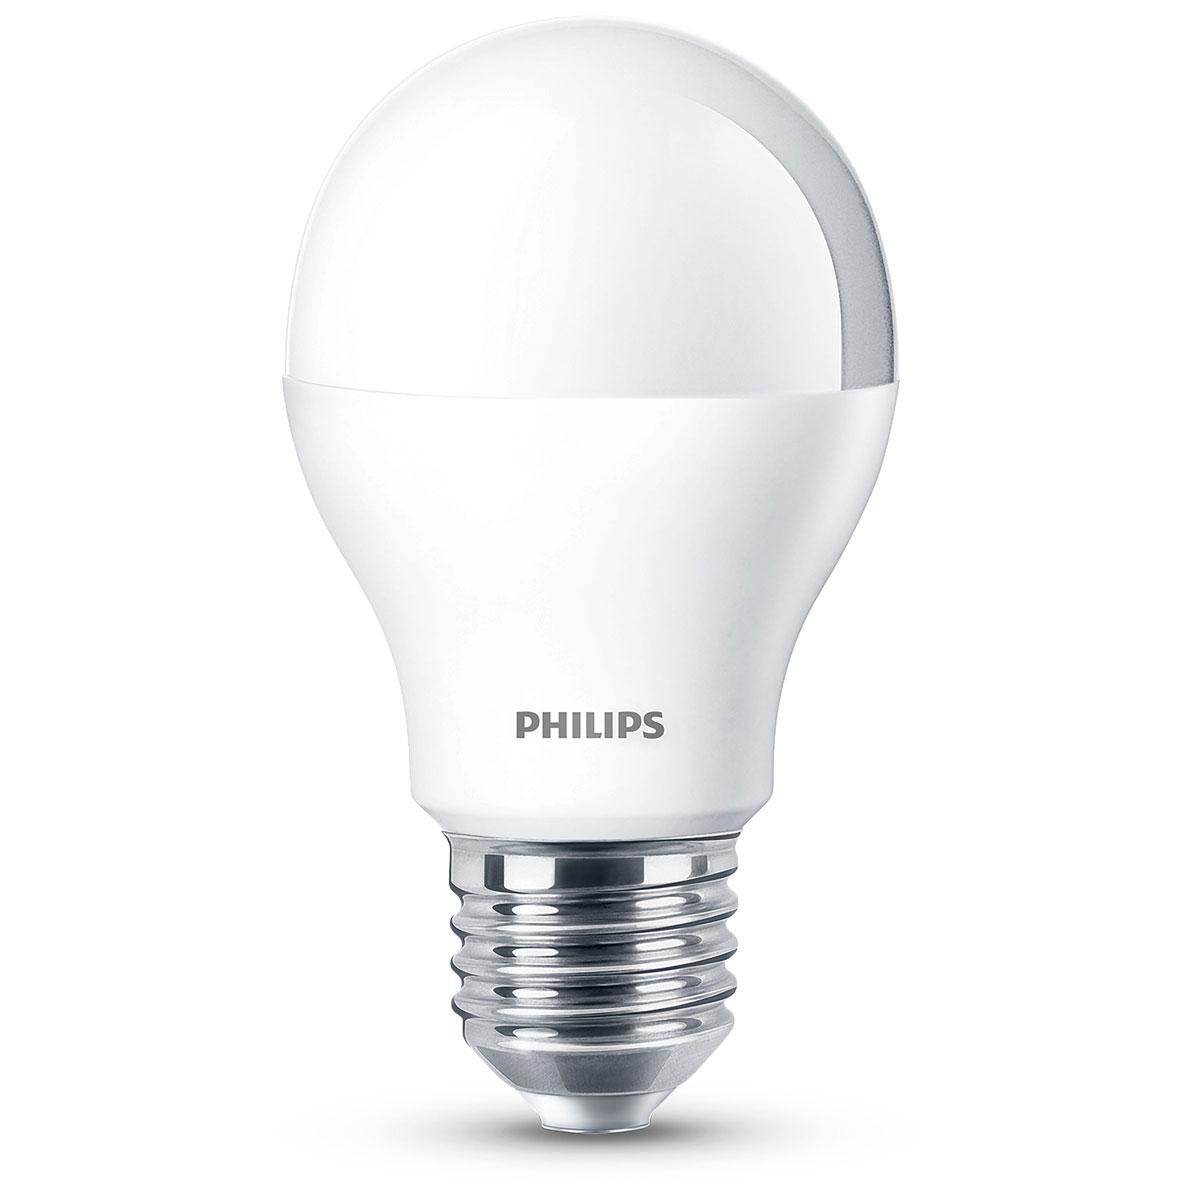 philips led lamp mat kaars 48w e27. Black Bedroom Furniture Sets. Home Design Ideas